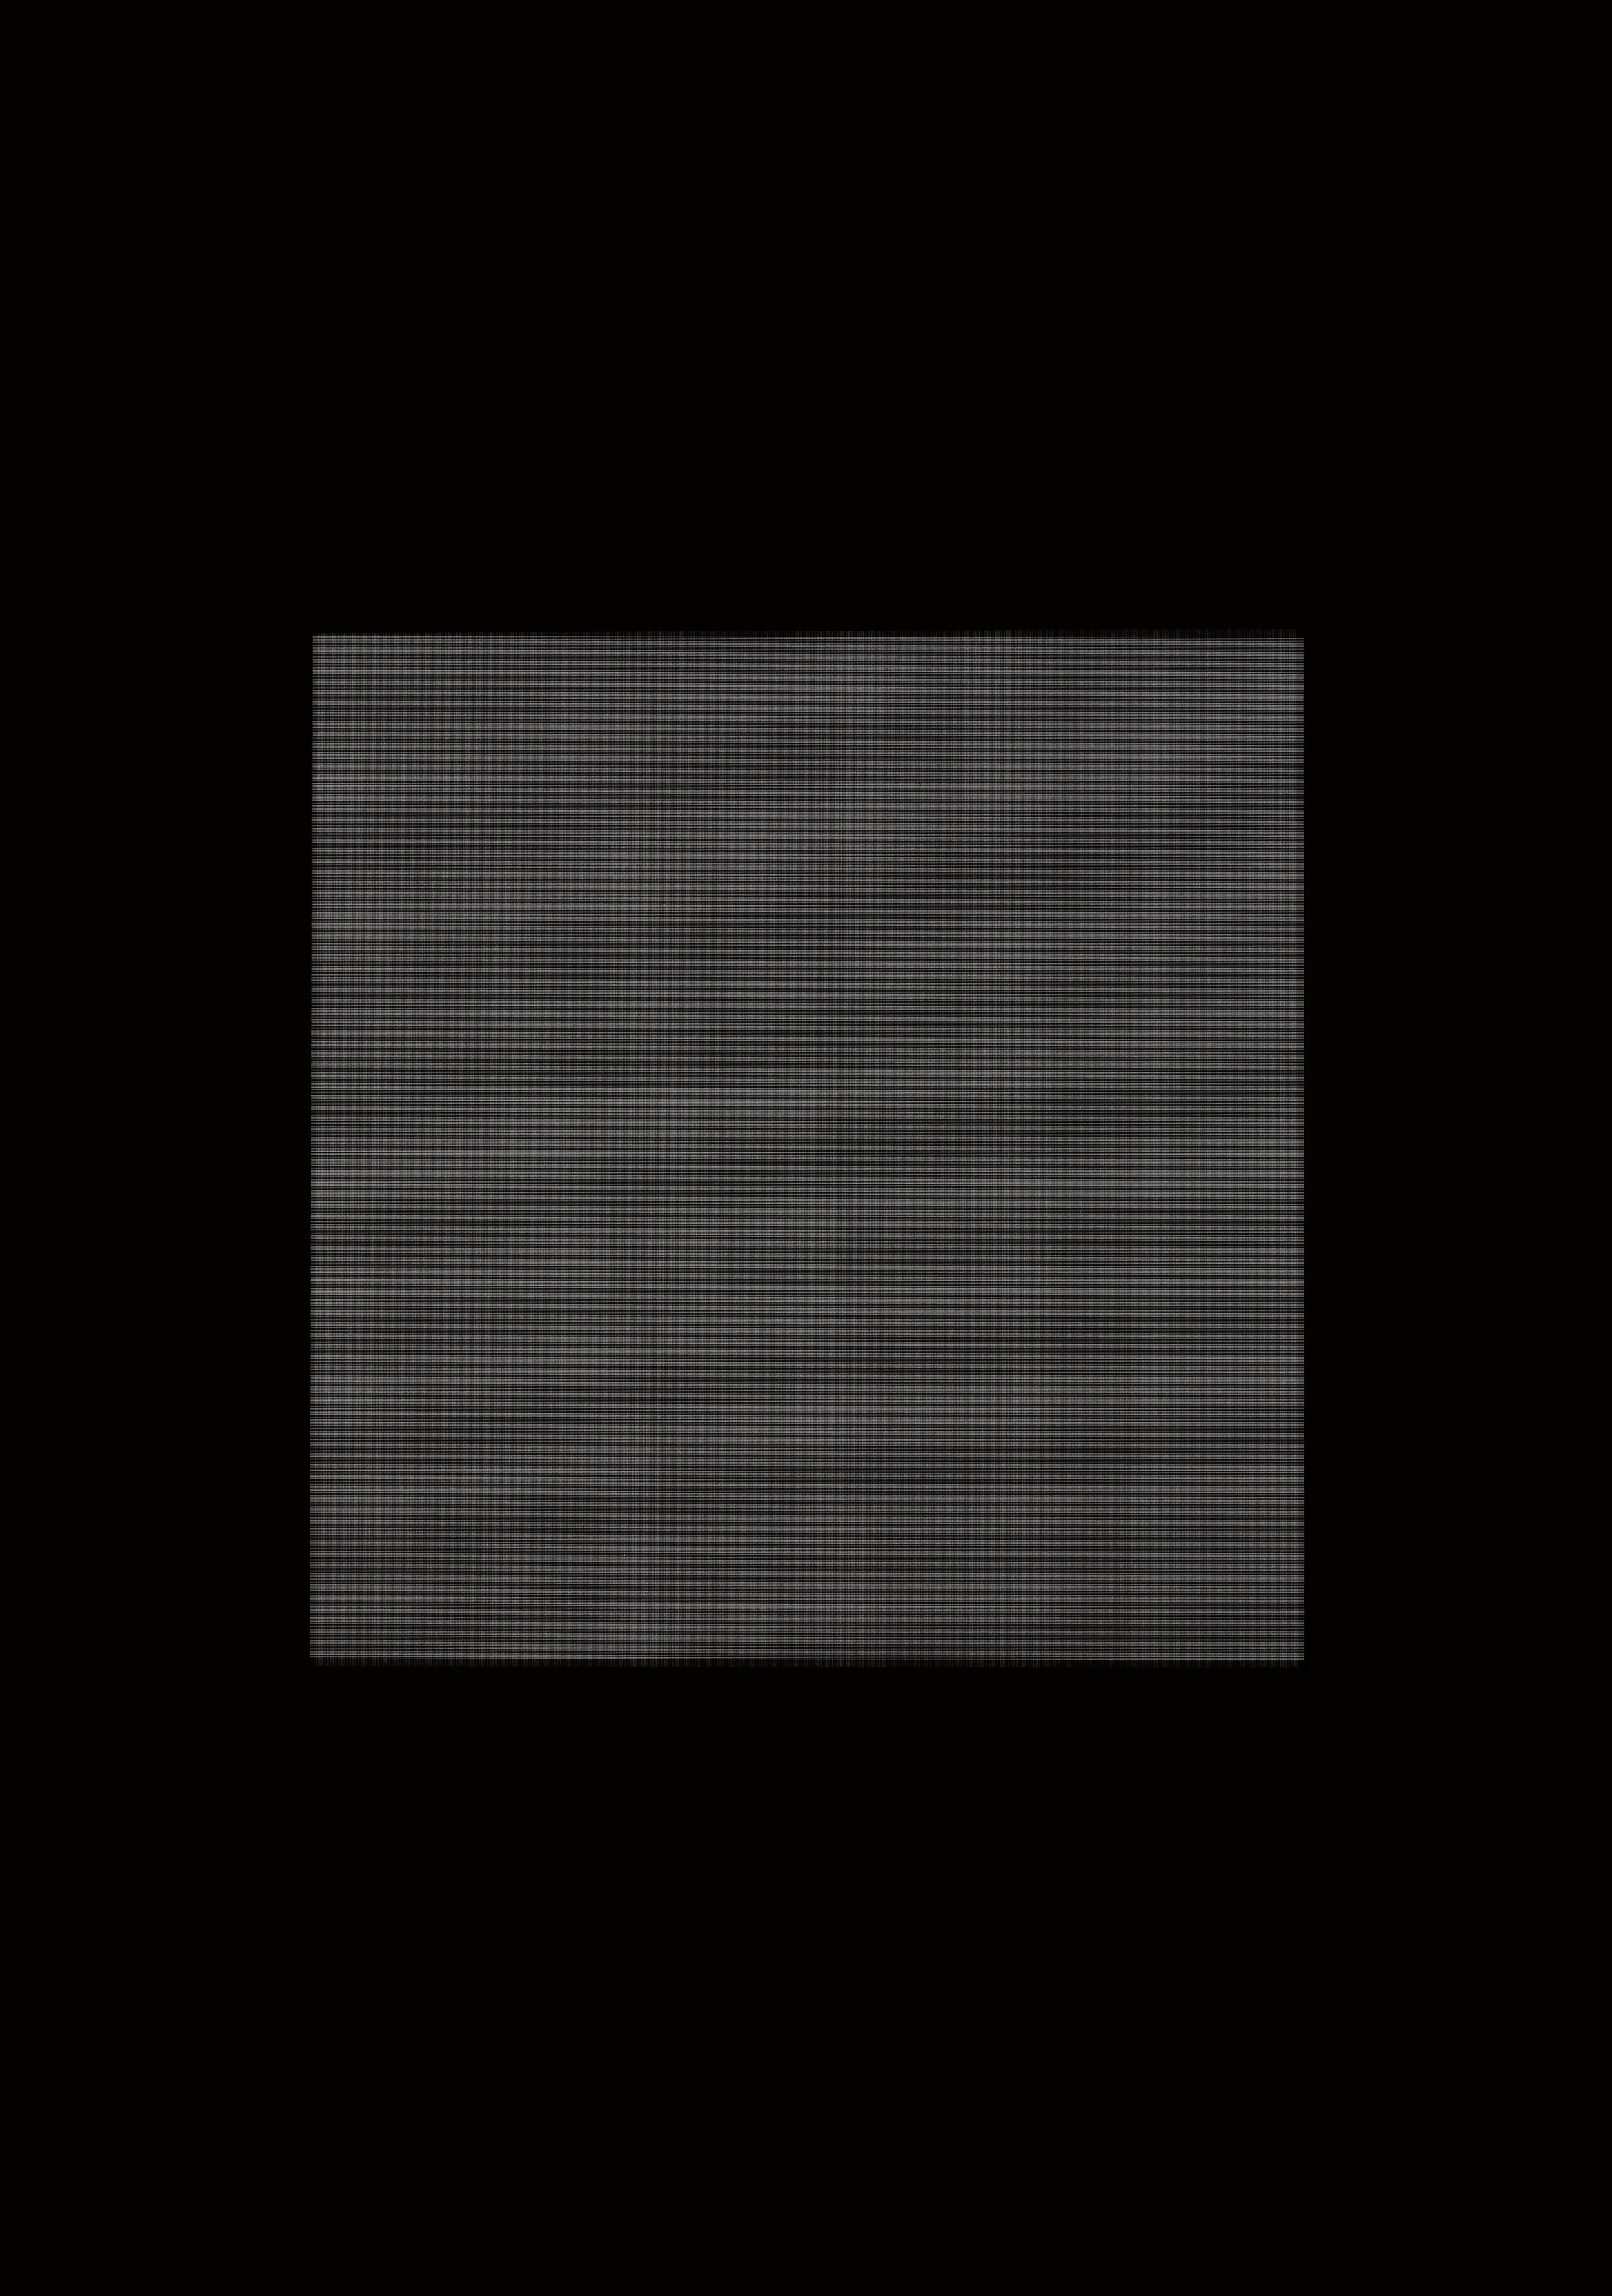 Untitled , Pigment print, 42 x 59,4 cm, 2017